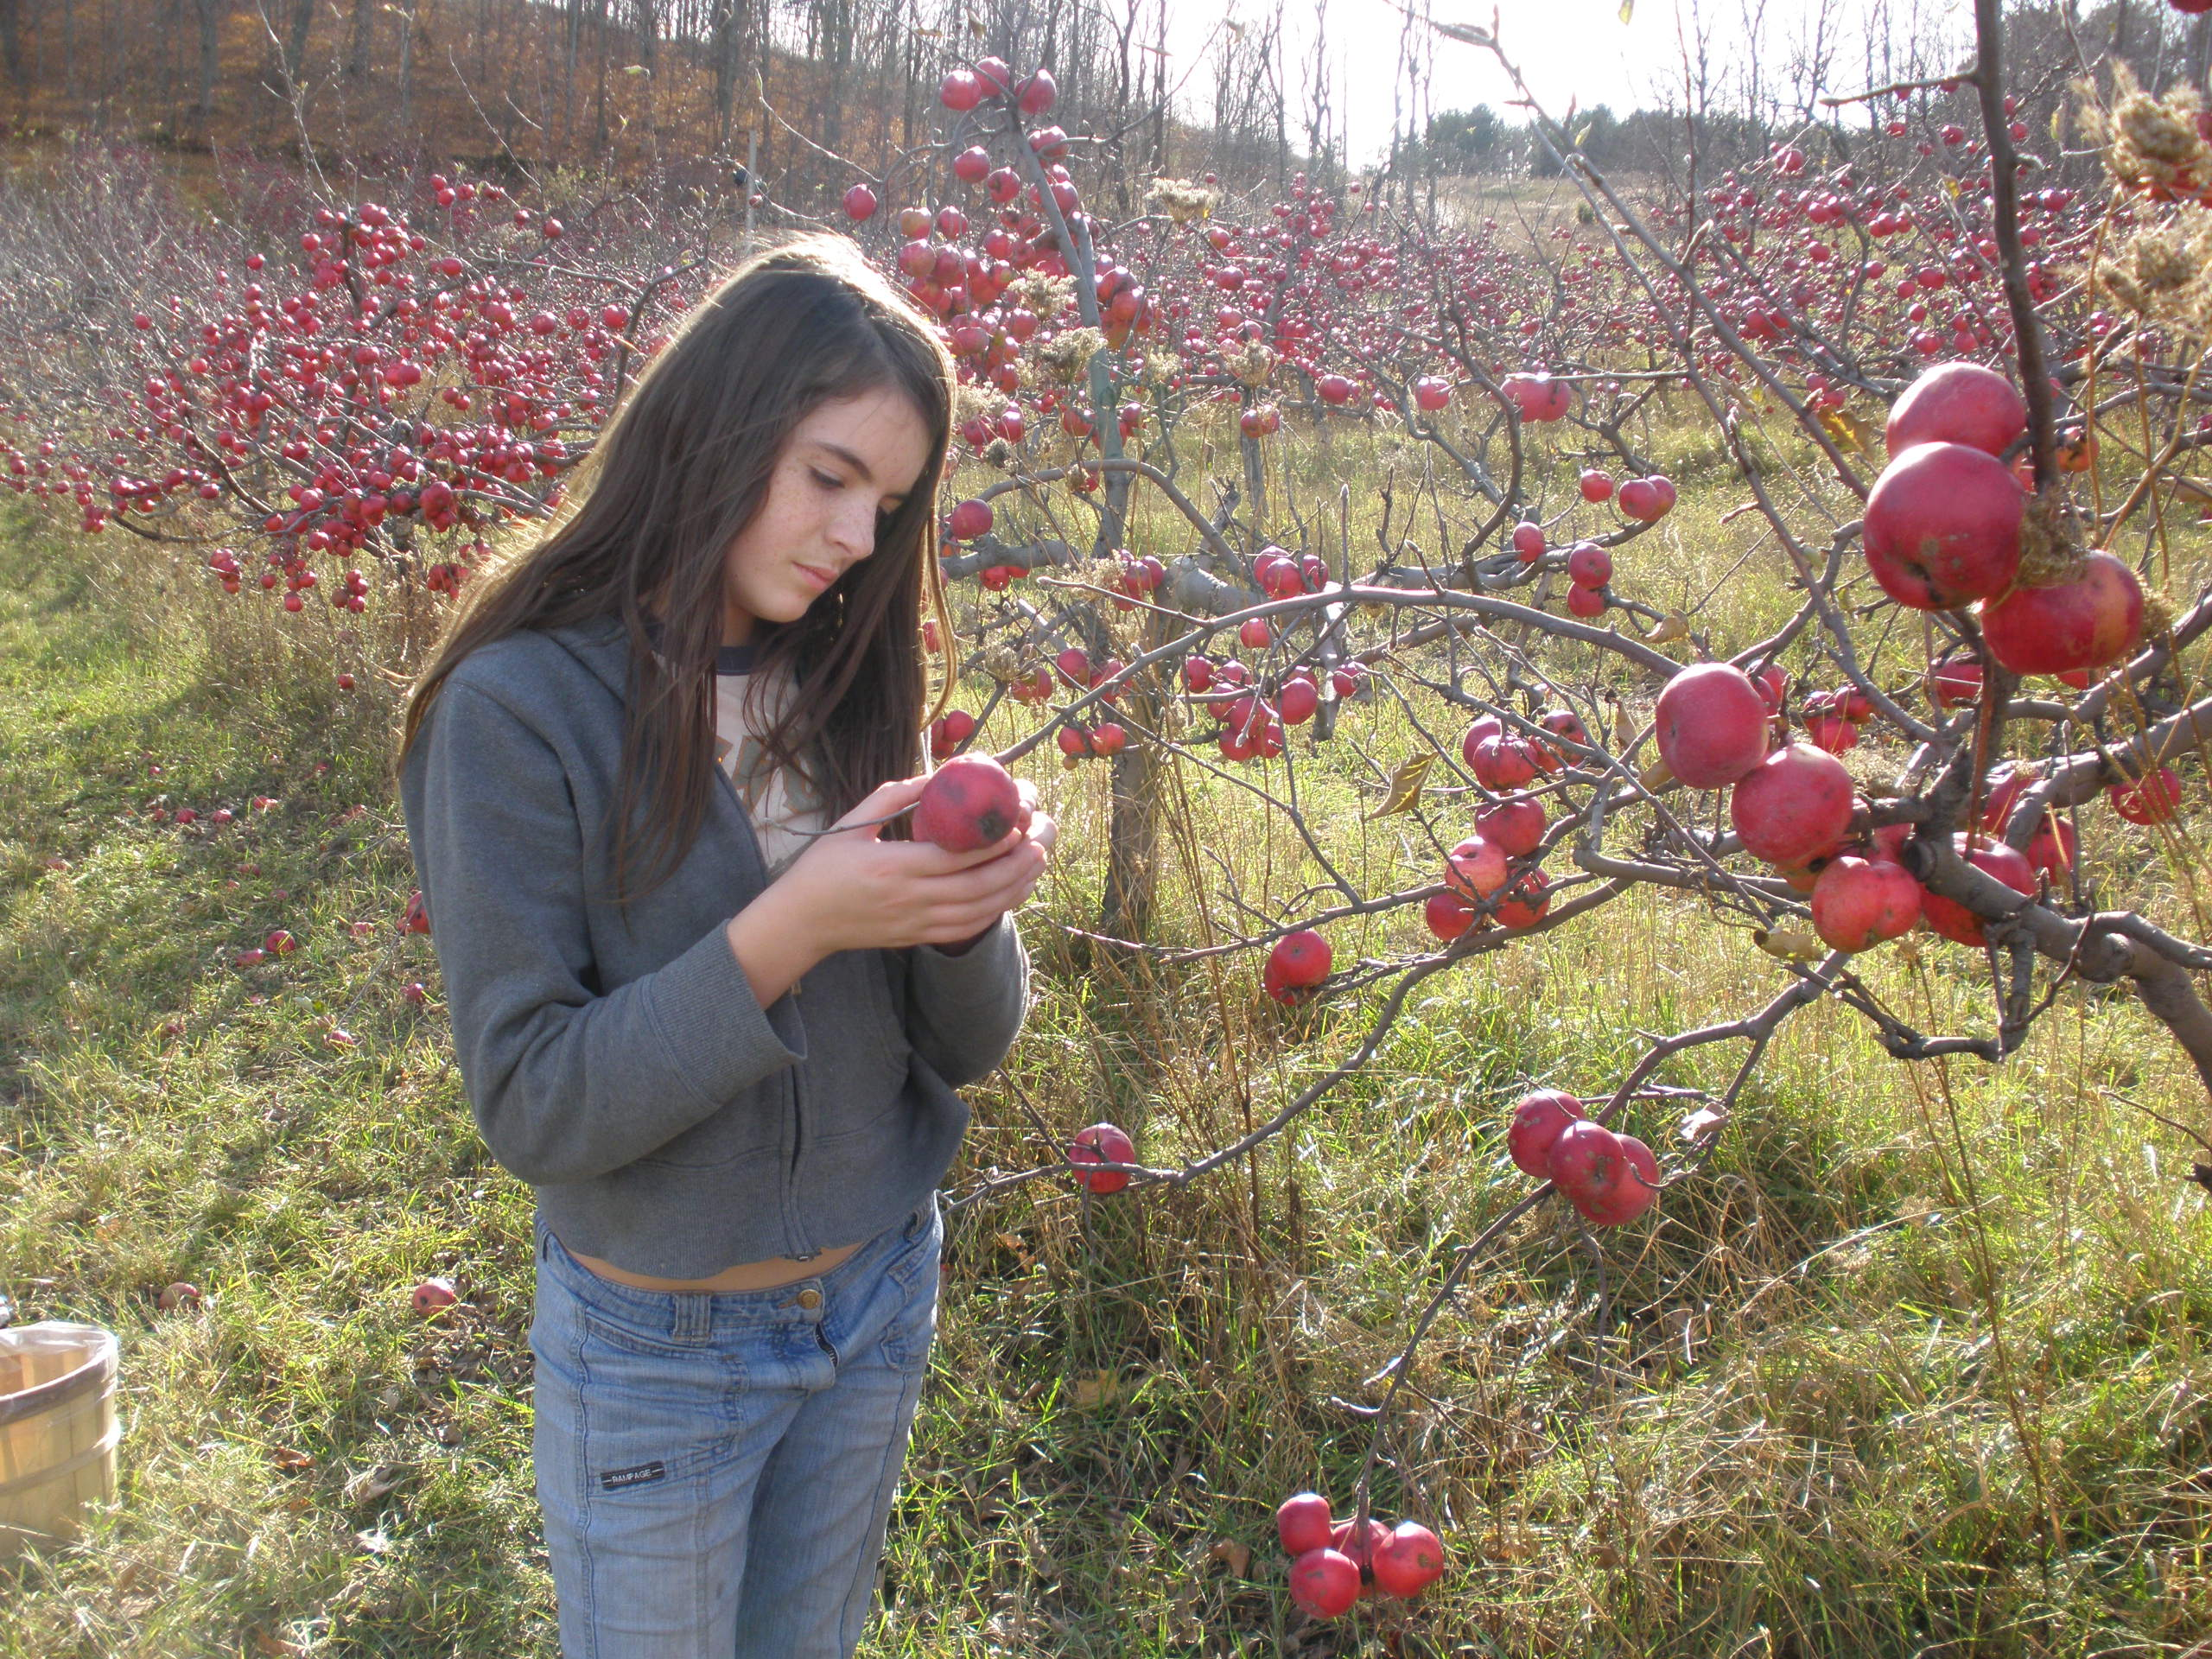 Pickin' Apples